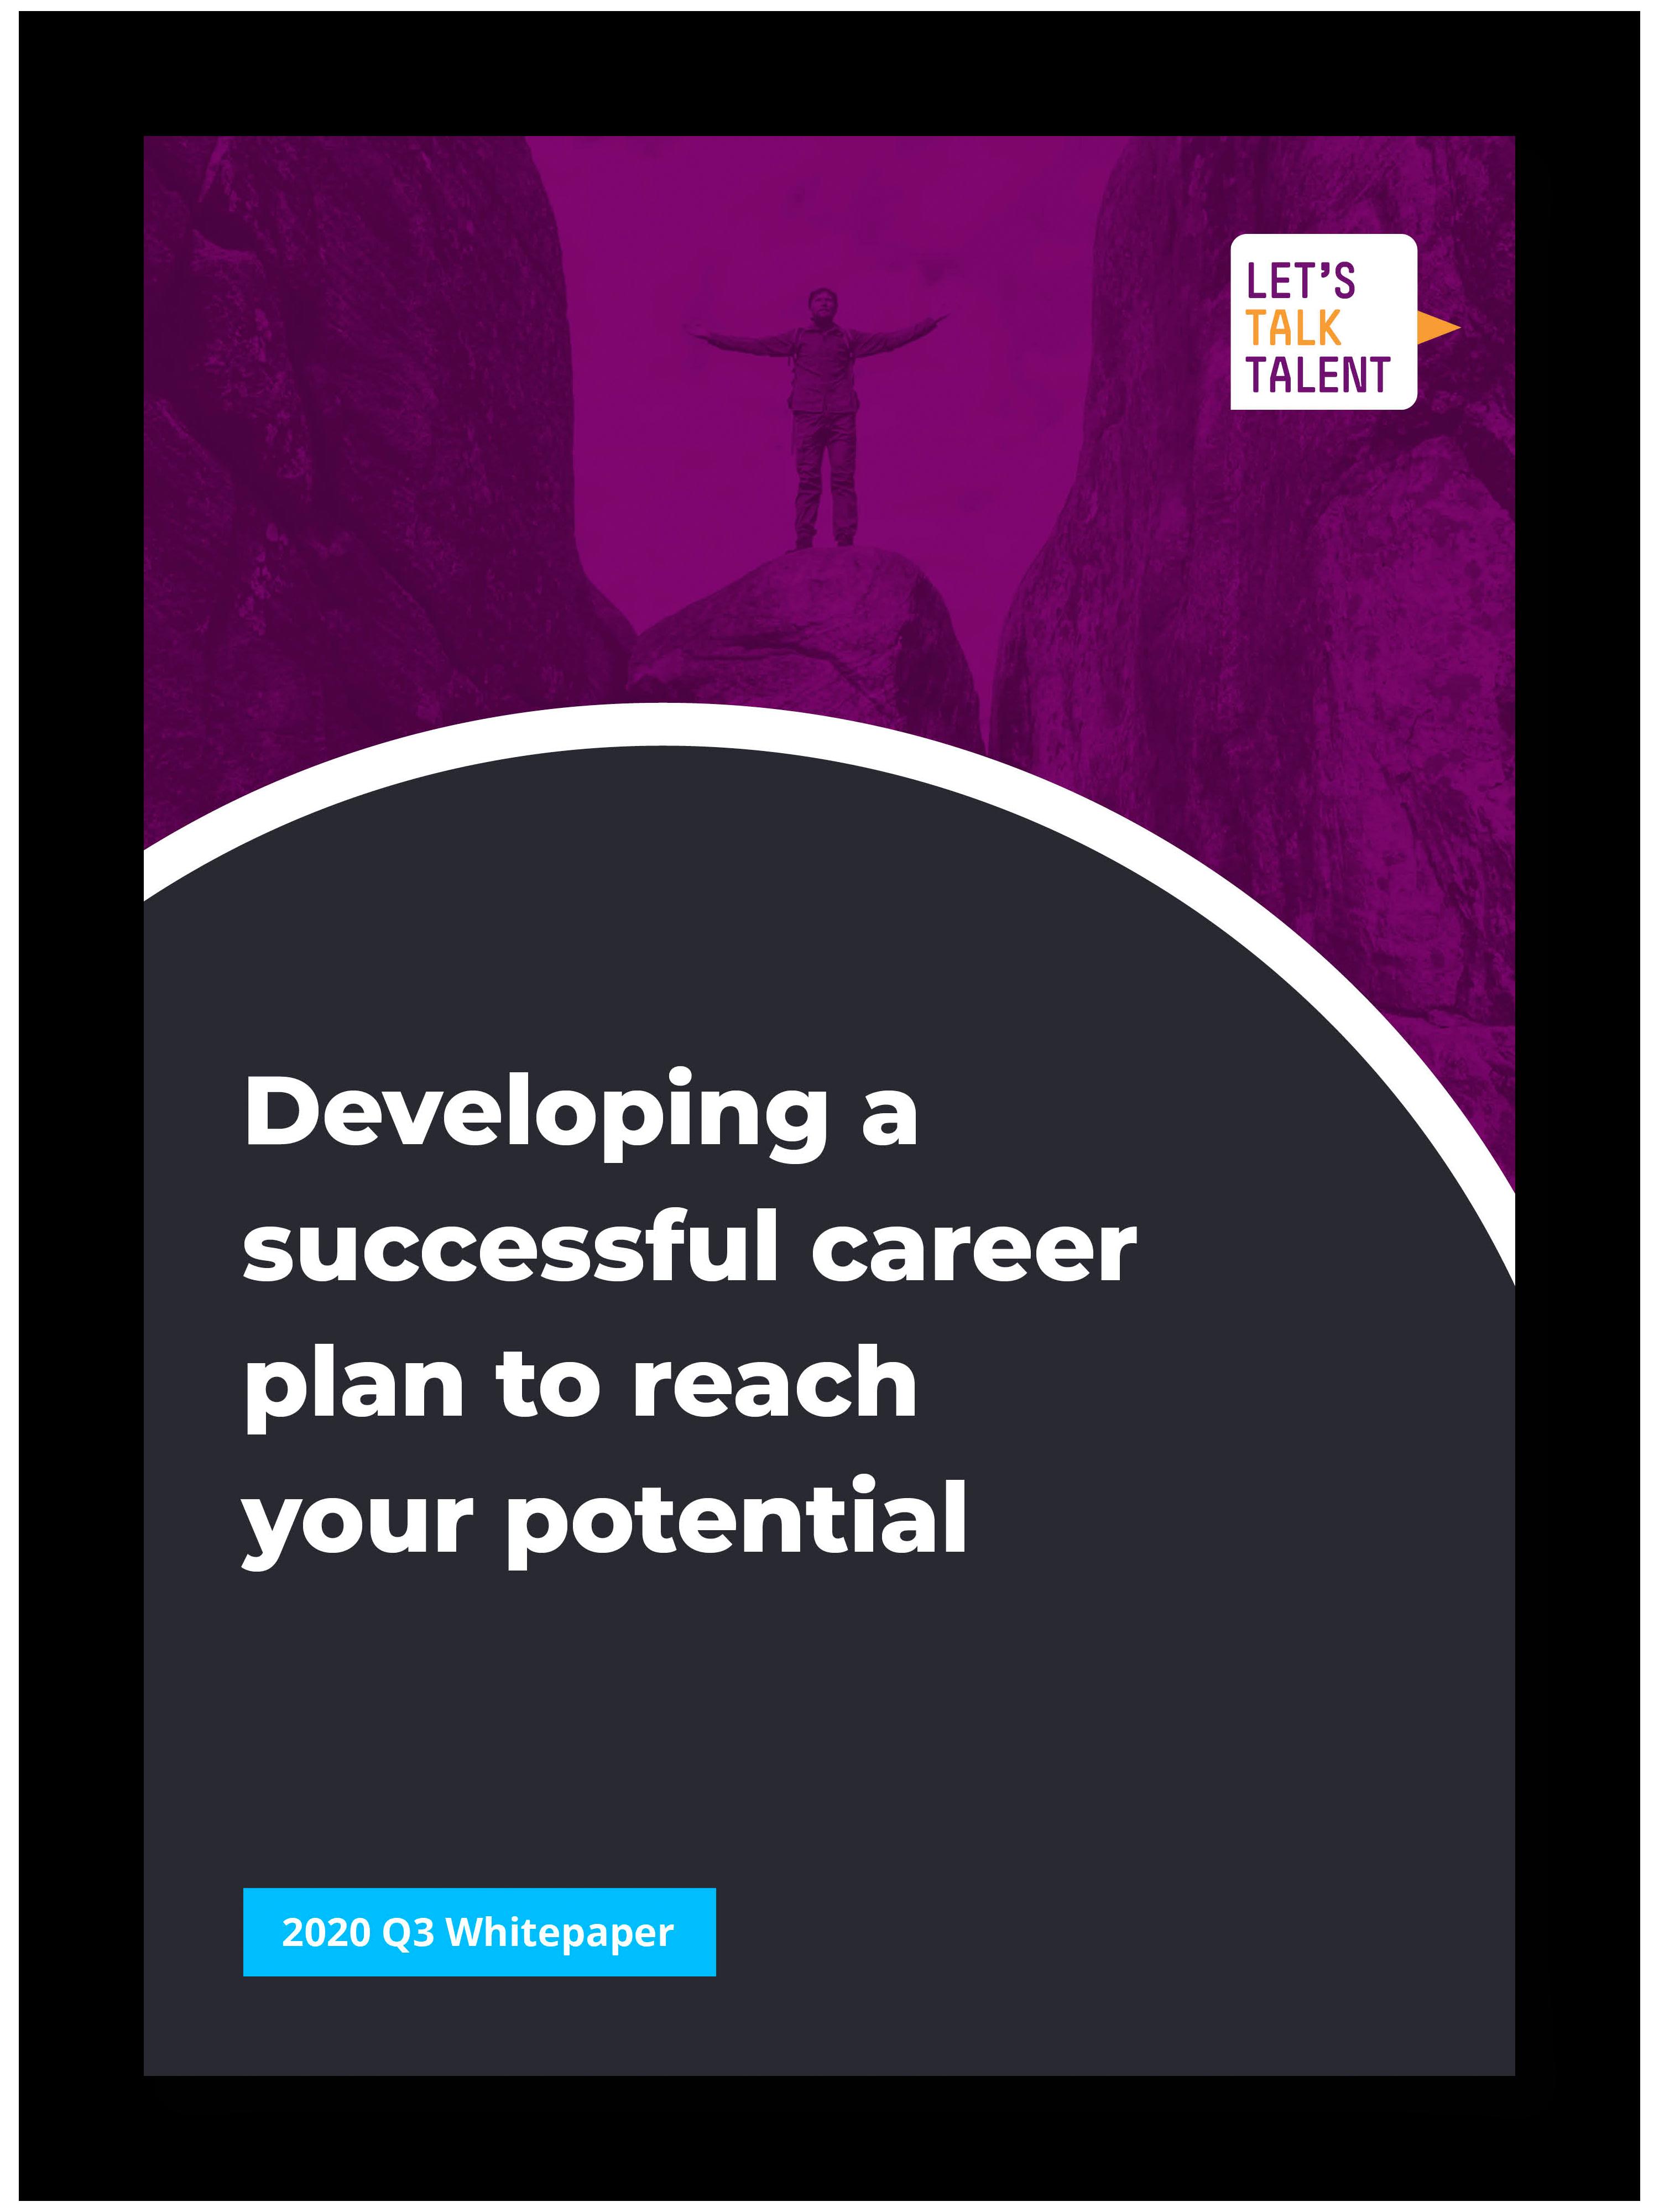 Career Planning Whitepaper